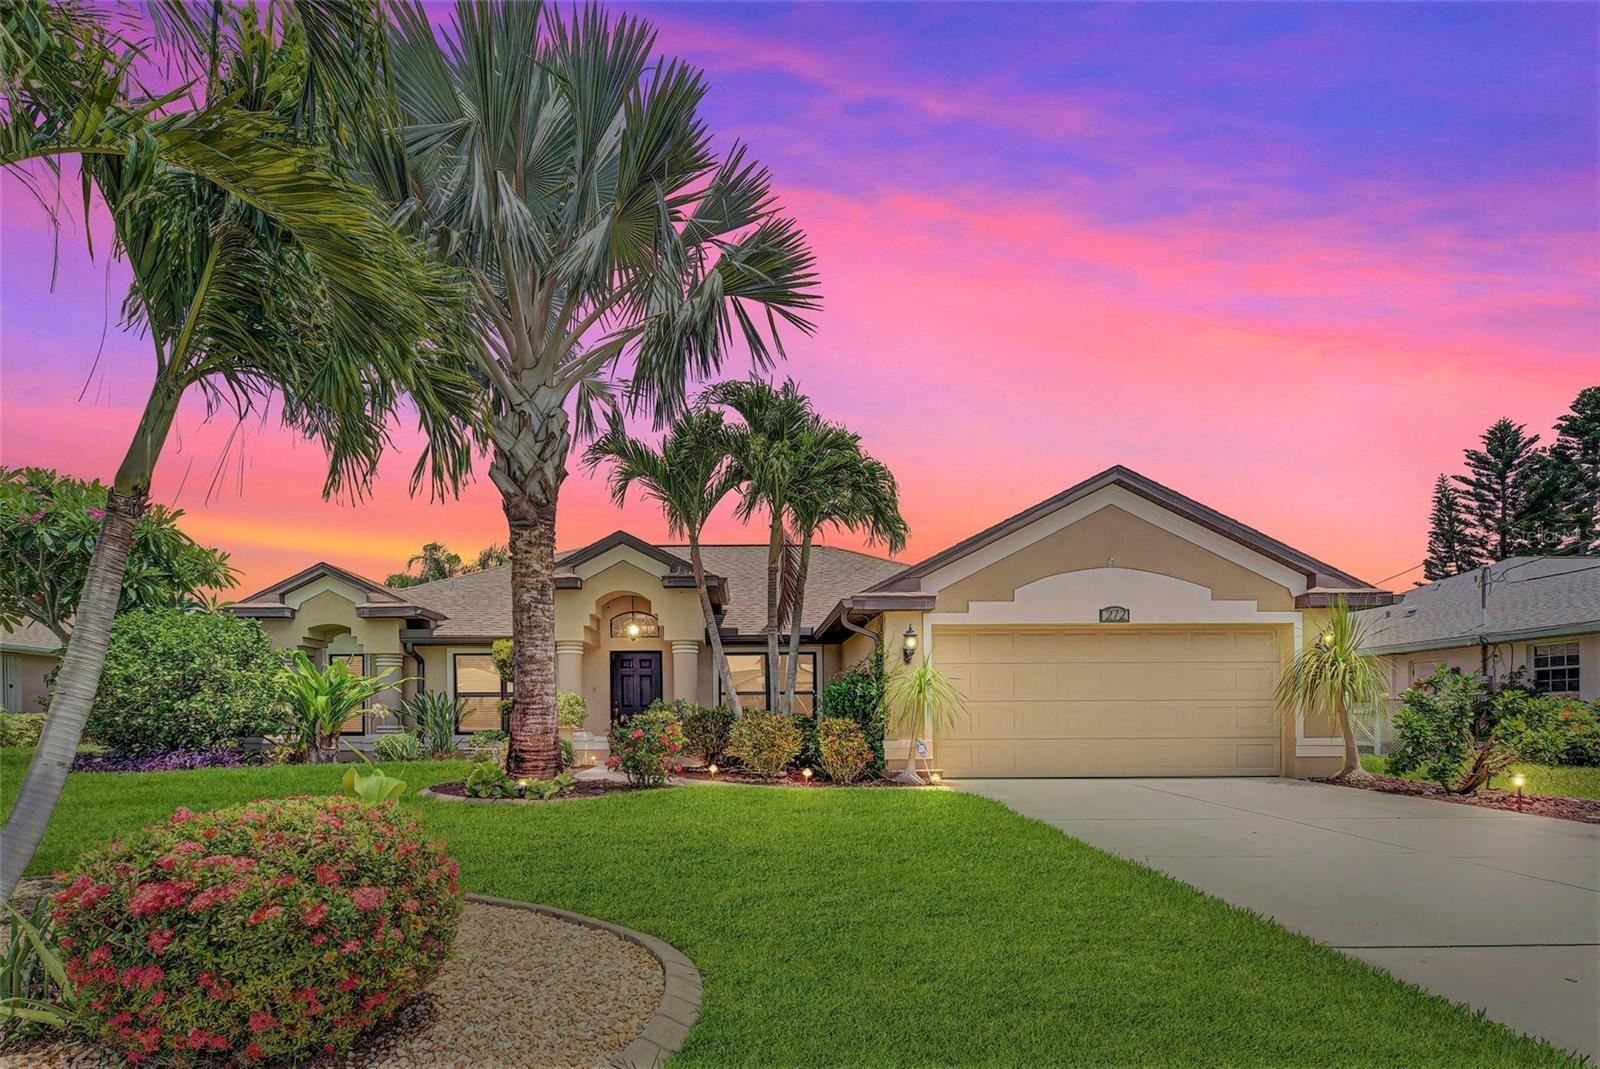 Photo of 272 LONG MEADOW LANE, ROTONDA WEST, FL 33947 (MLS # C7446295)